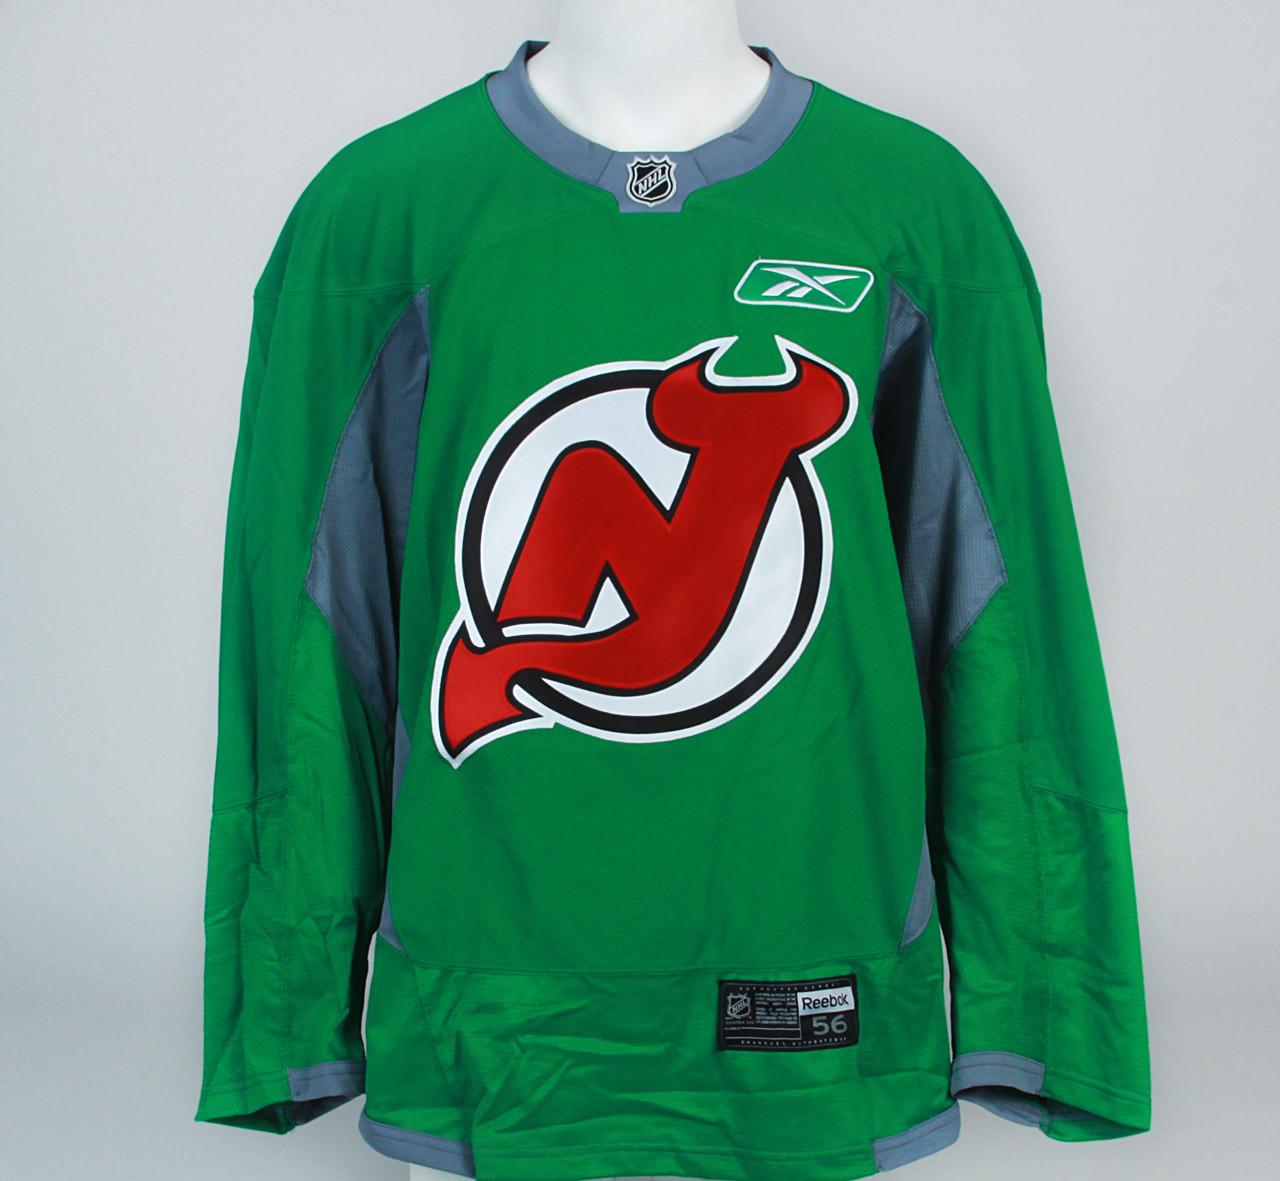 ... Practice Jersey - New Jersey Devils - Green Reebok Size 56. Image 1 ca025d784